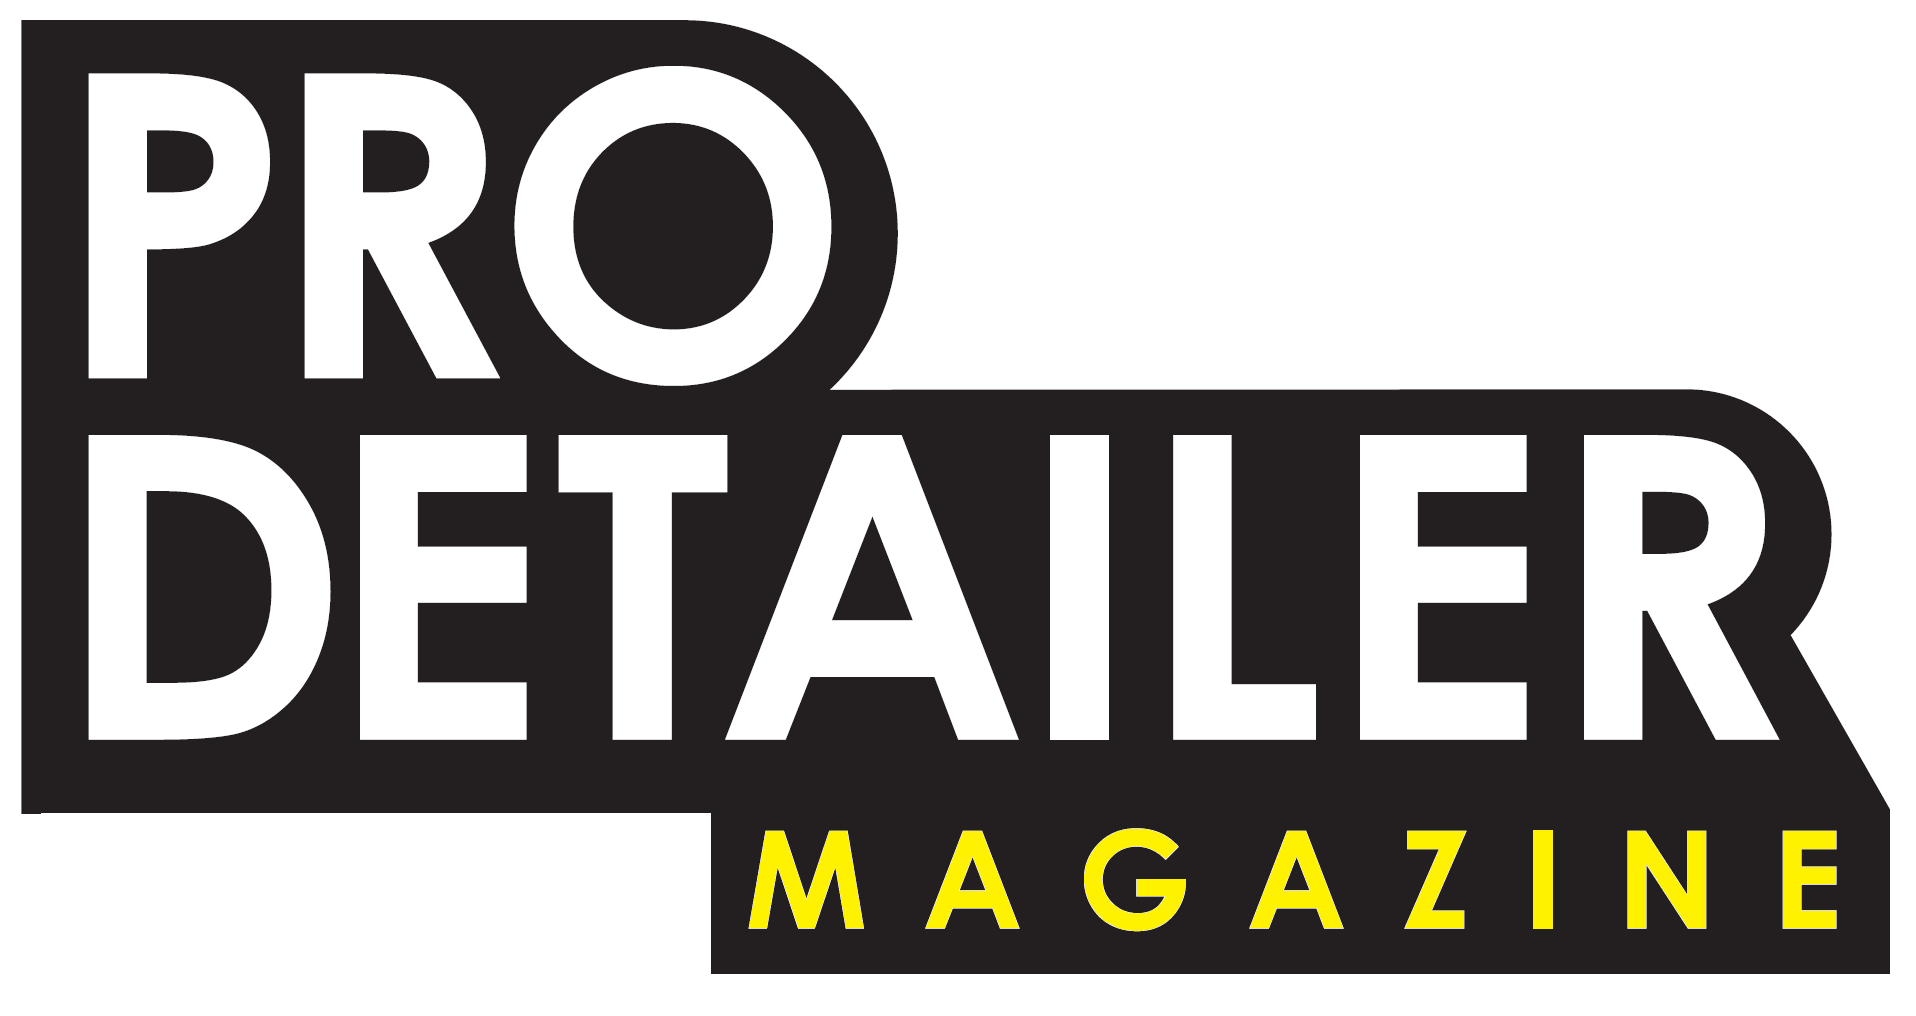 PRO Detailer Magazine Logo Trans